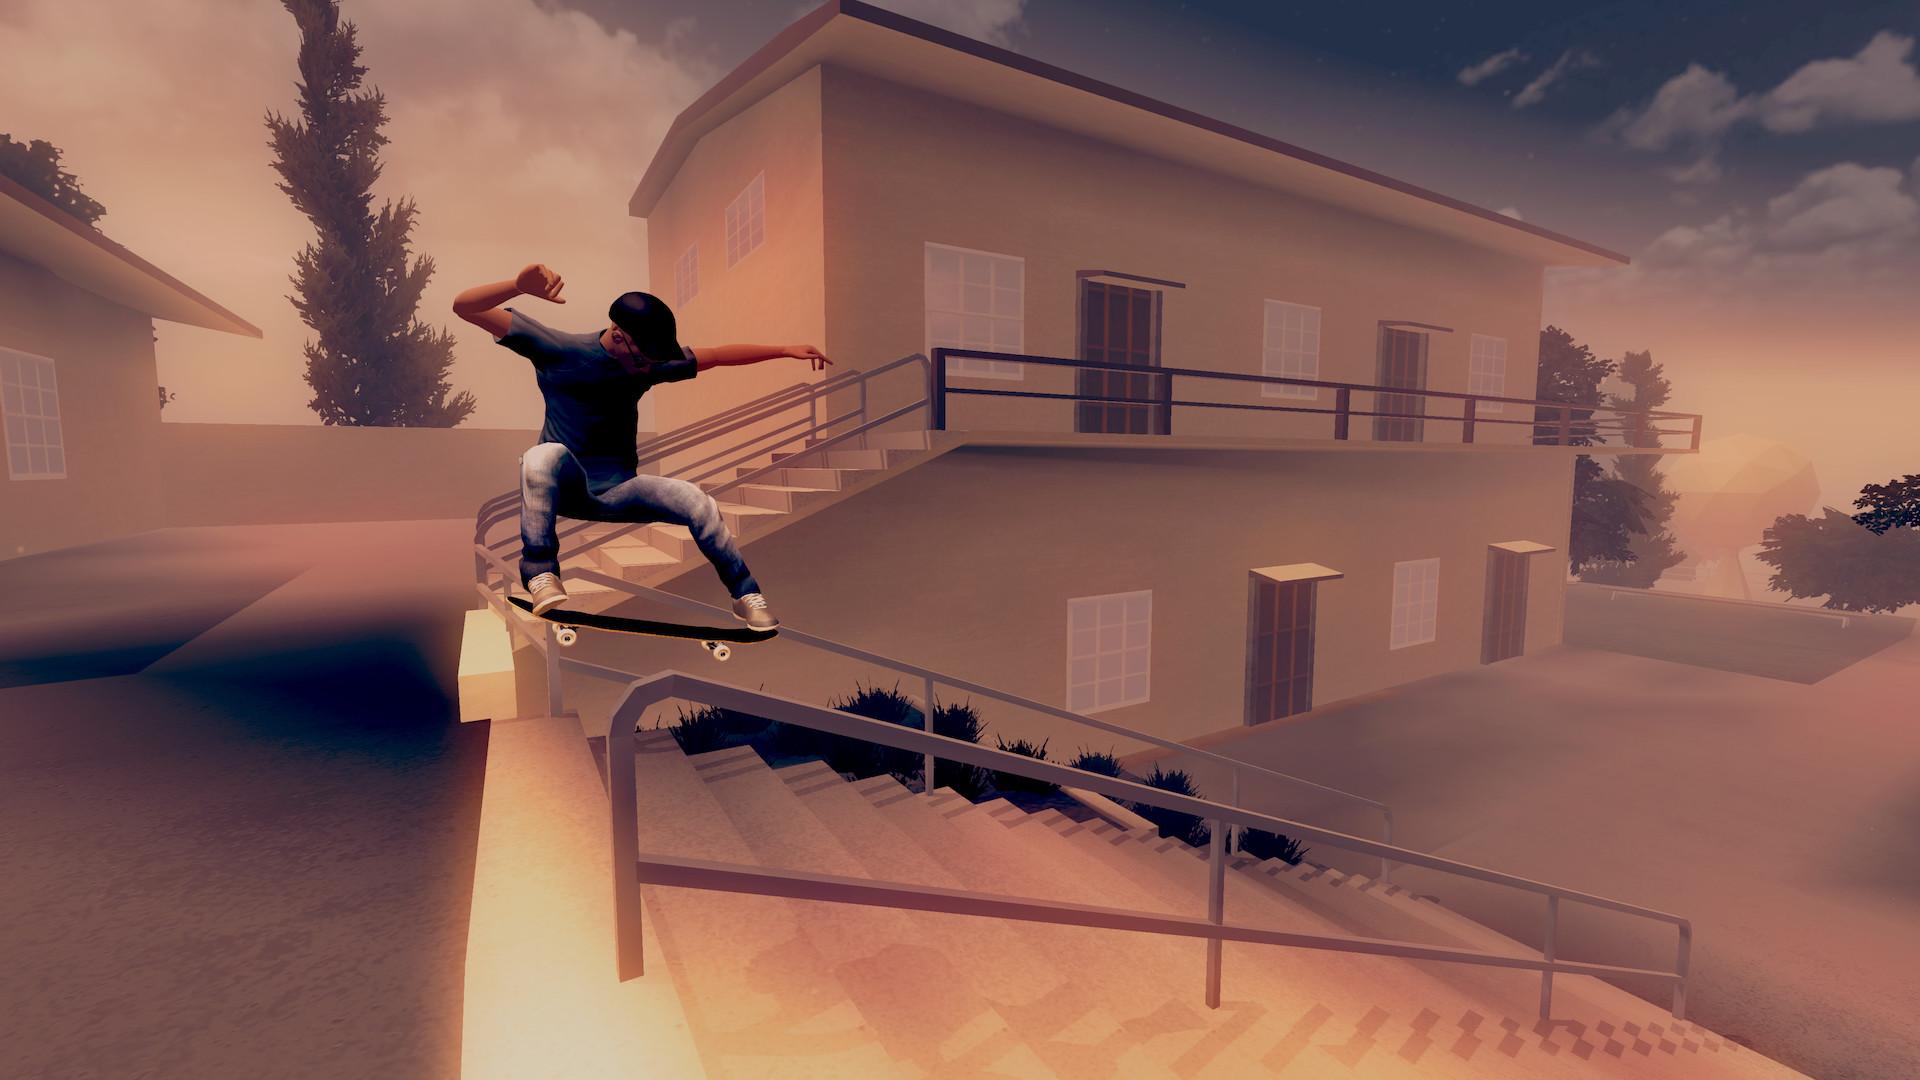 Nintendo Download: Skate City screenshot